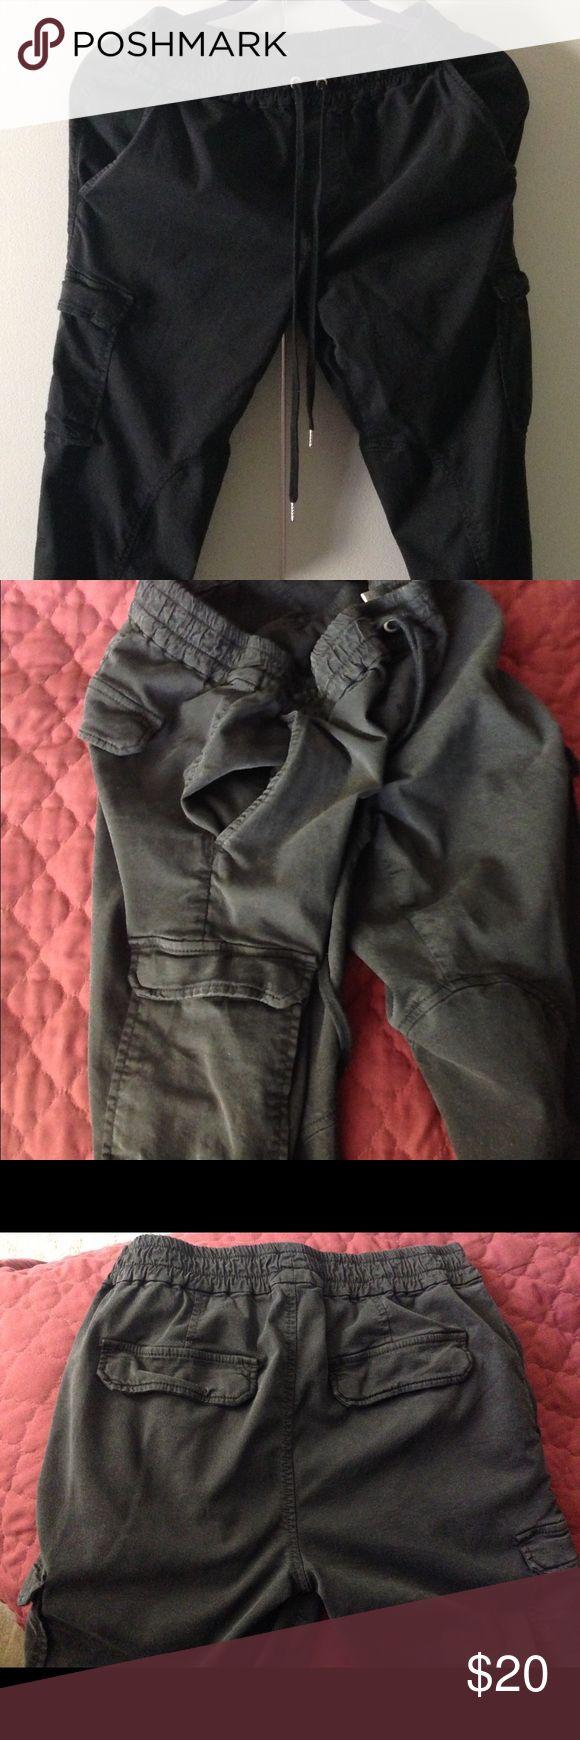 Joe's ladies size small cargo draw string 👖 pants Joe's ladies size small cargo draw string 👖 pants like new elastic waist 27/28 leg slims down lots of pockets fun to wear Joe's Jeans Pants